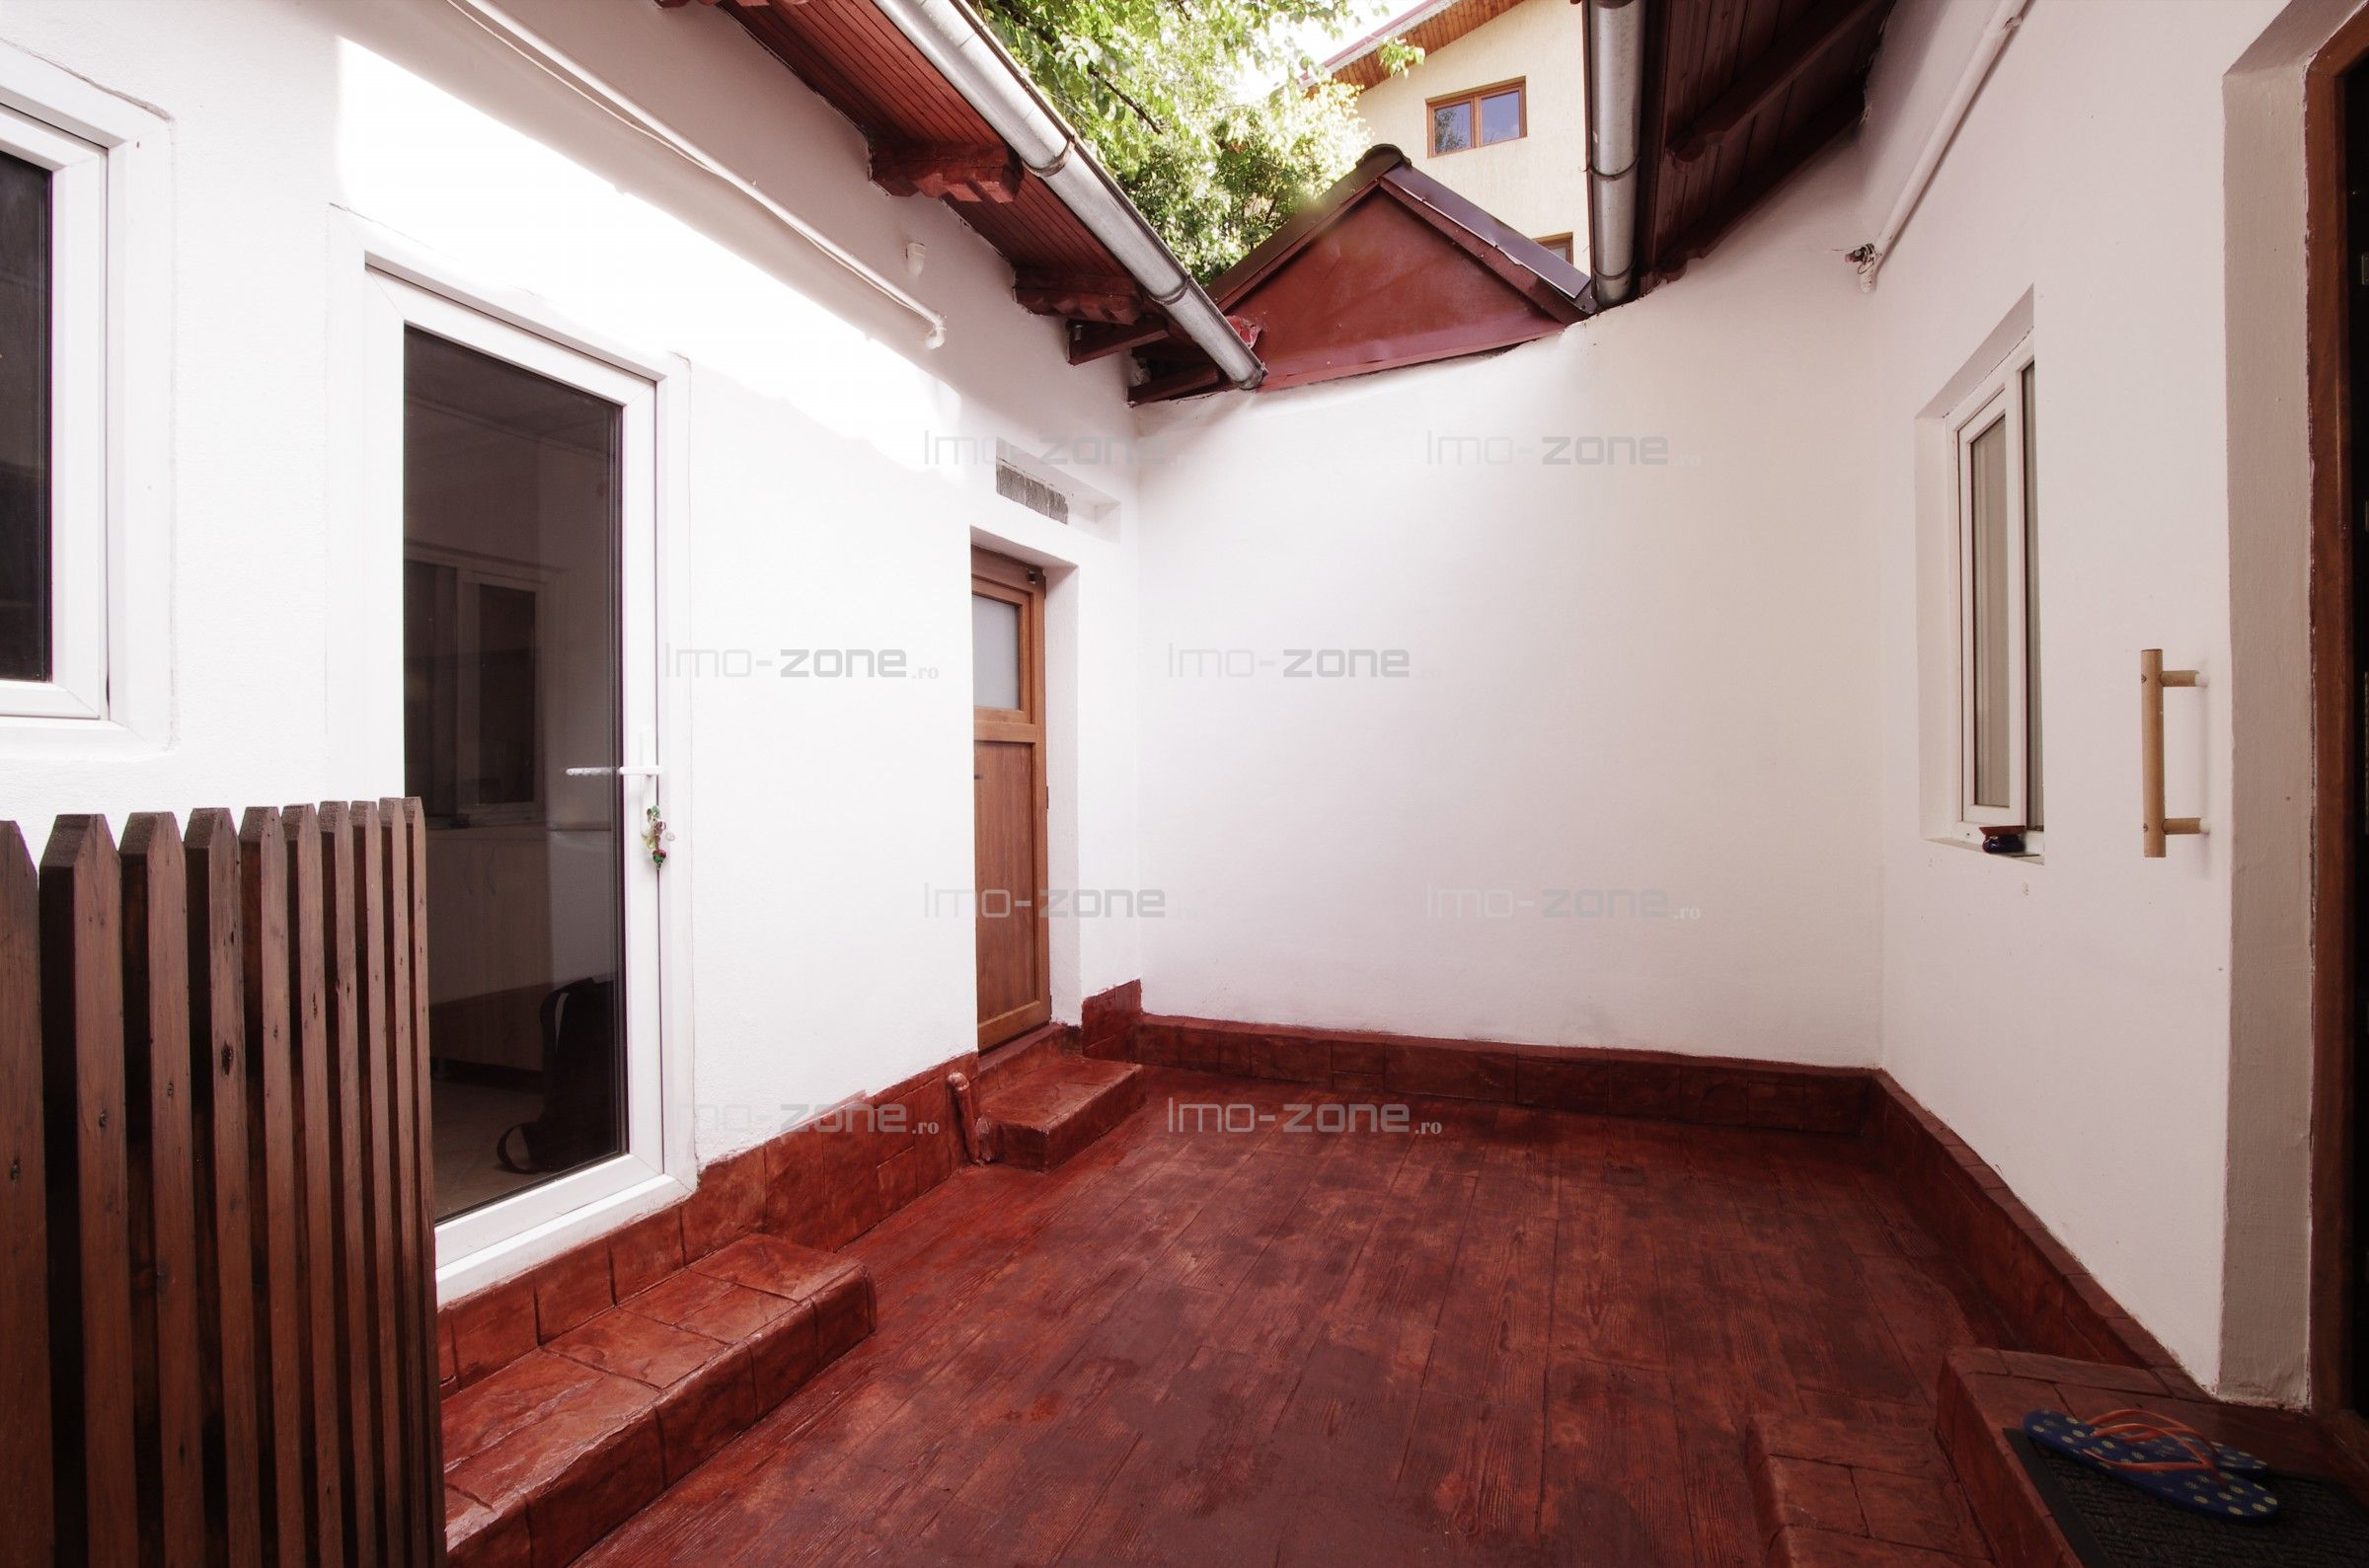 3 camere (2 camere + birou)+ terasa, Drumul Taberei - Razoare, 390 Eur